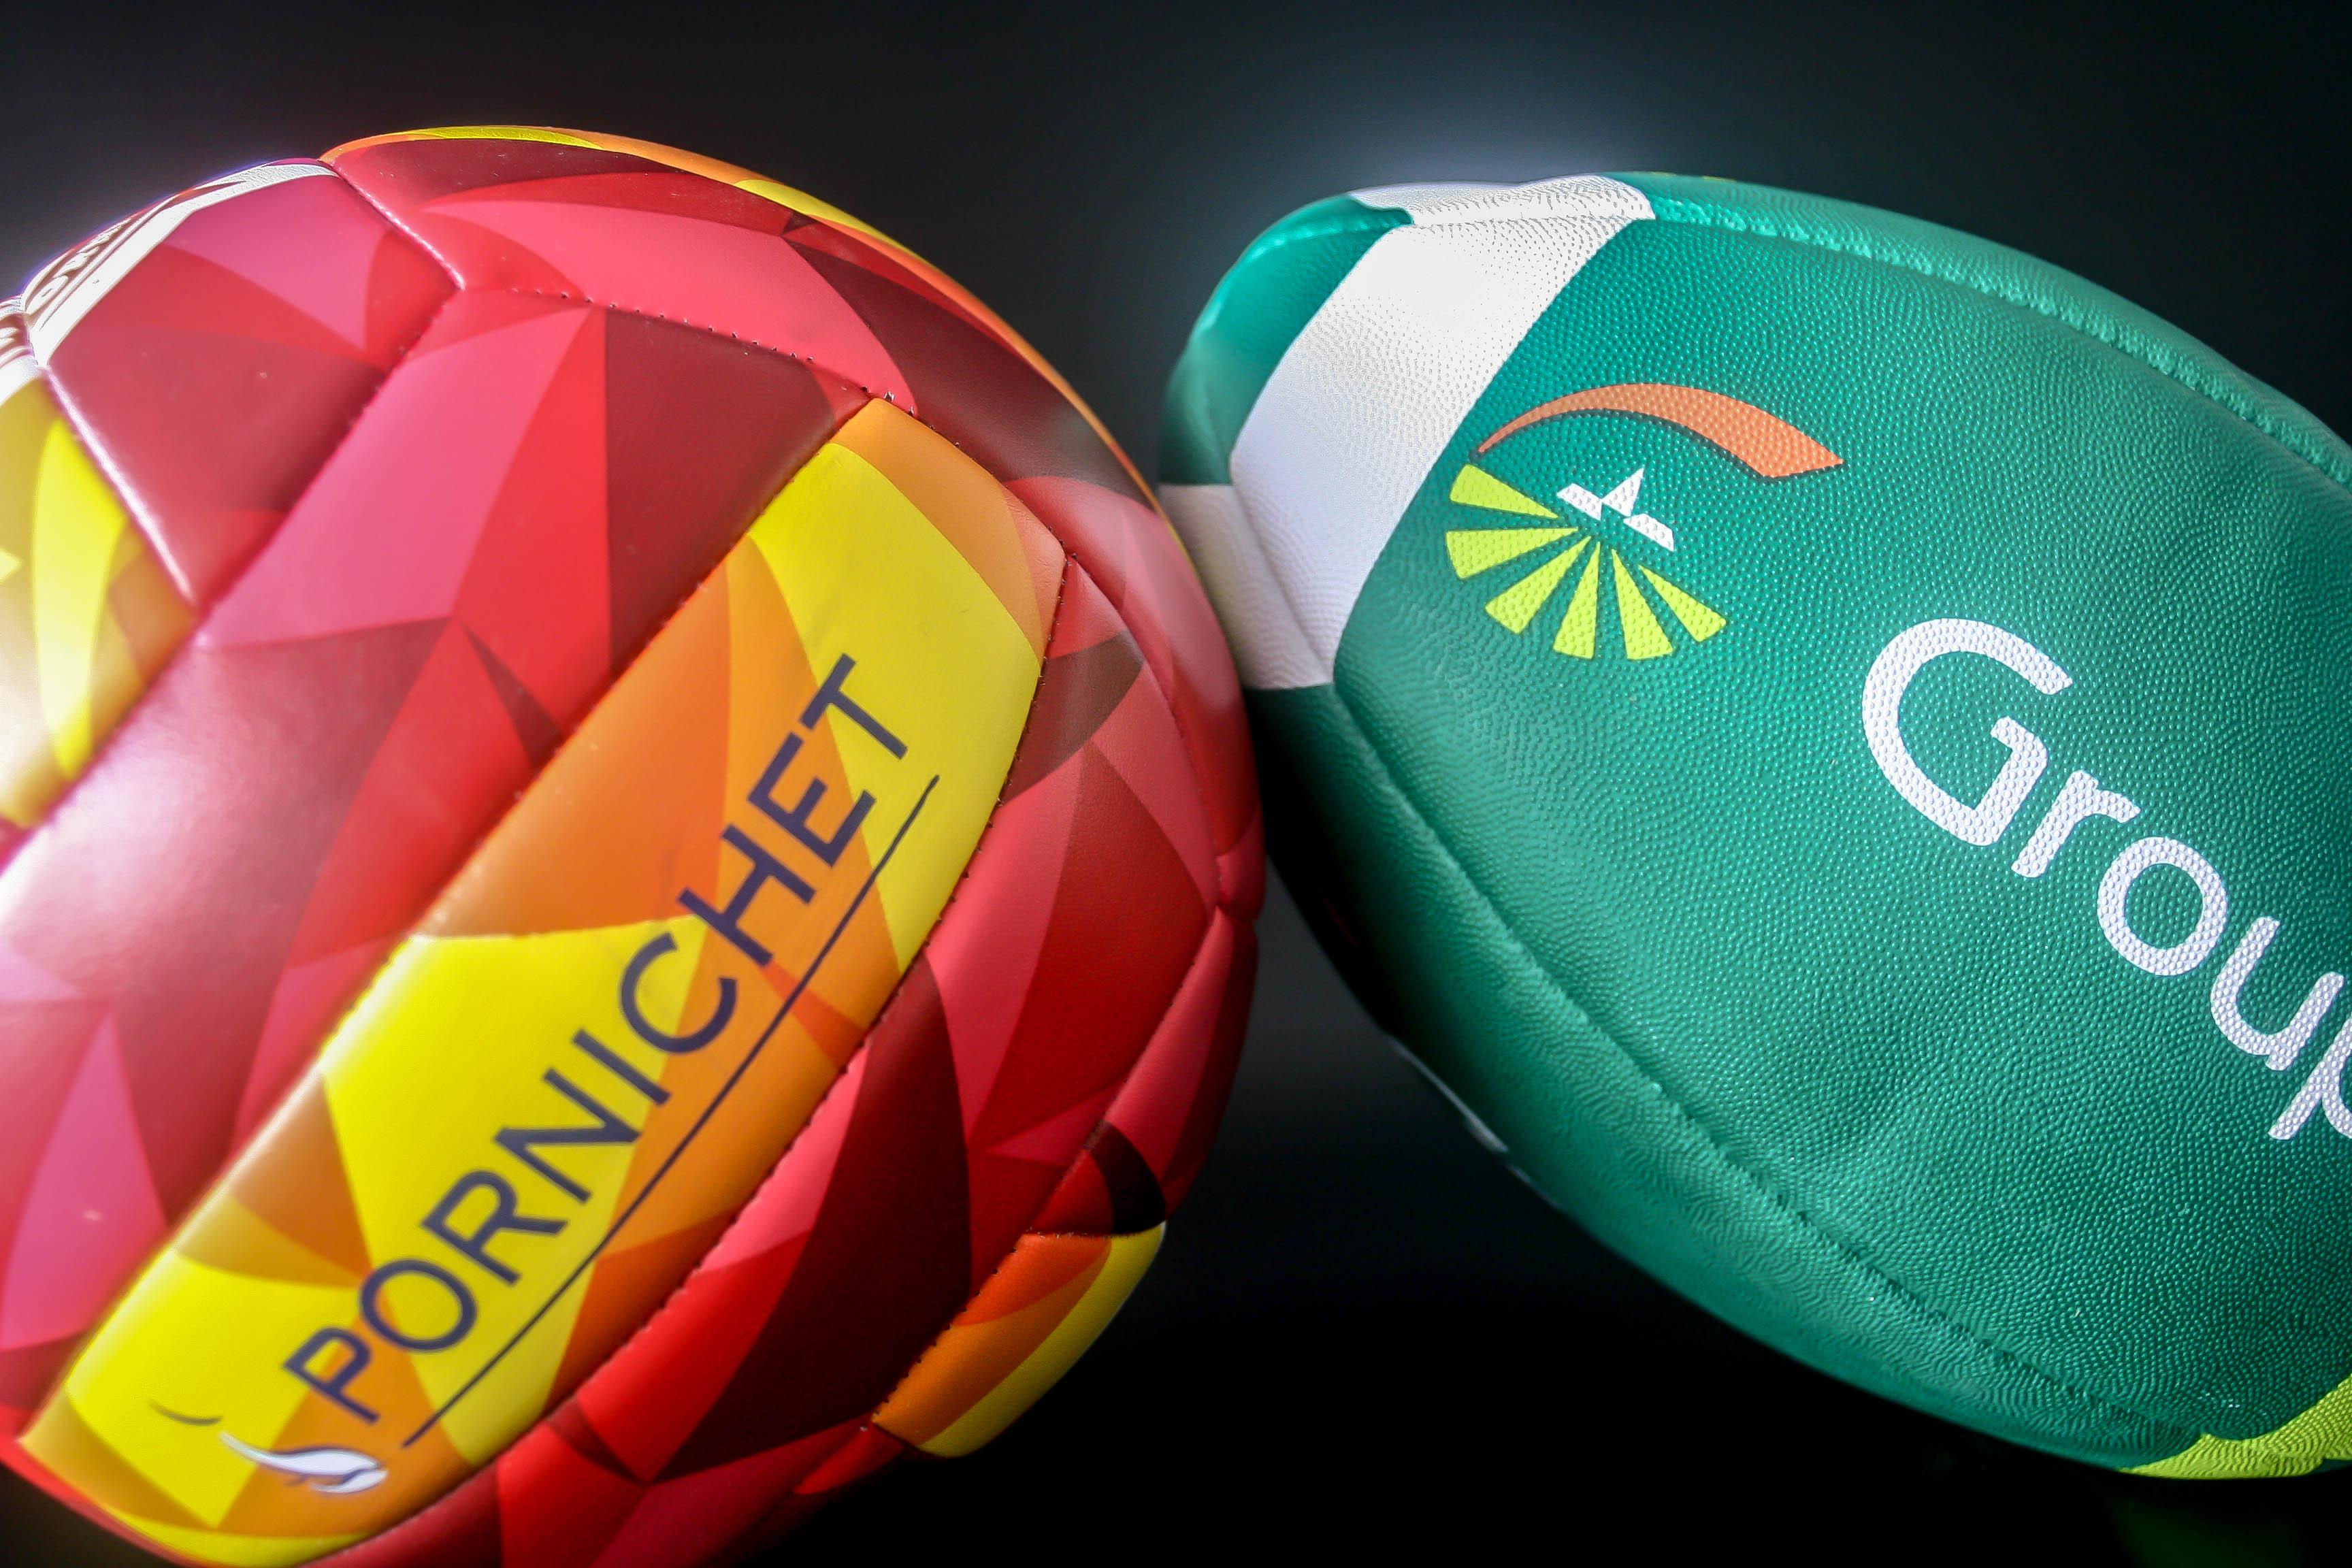 Ballon personnalisé Chambéry